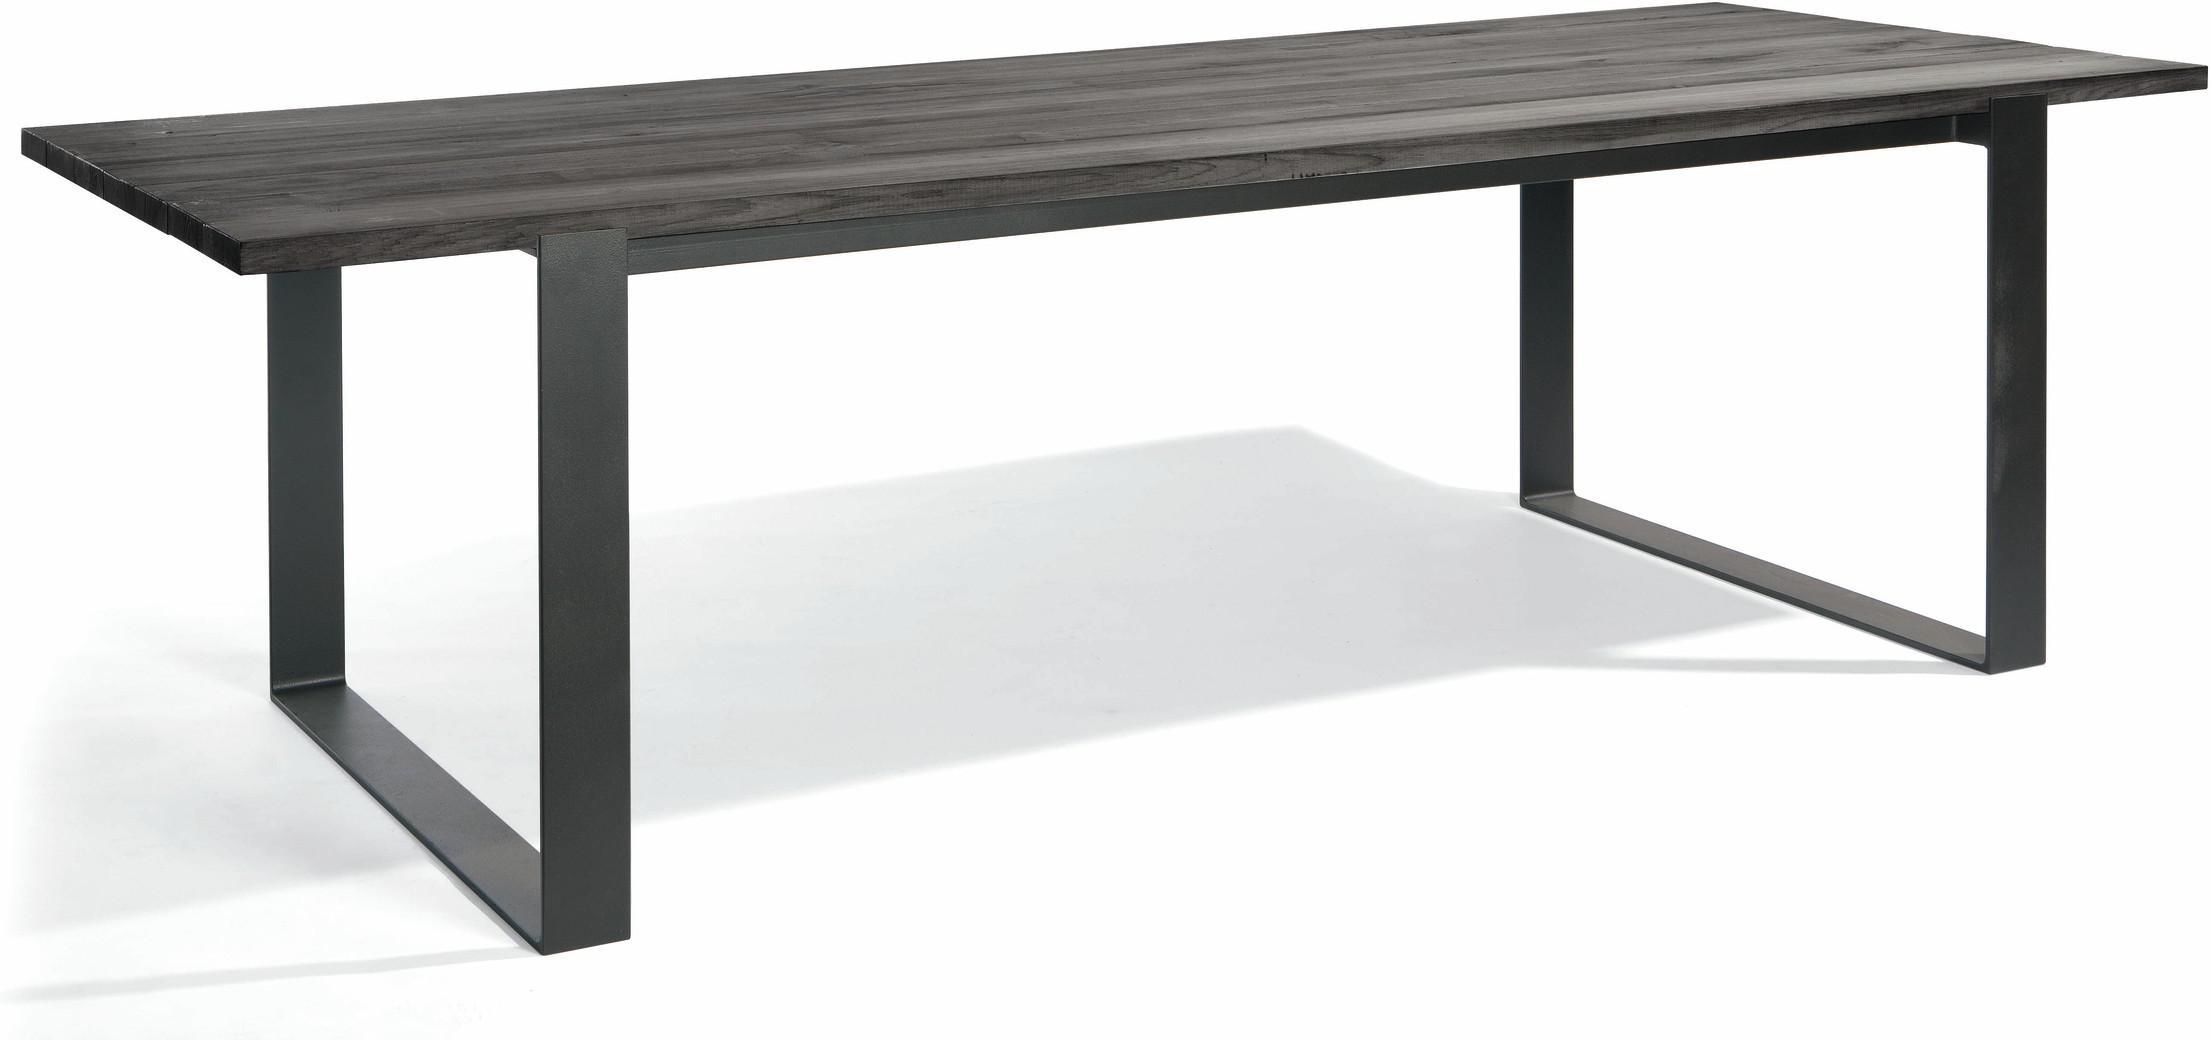 Prato Dining table - lava - Teak nero 270